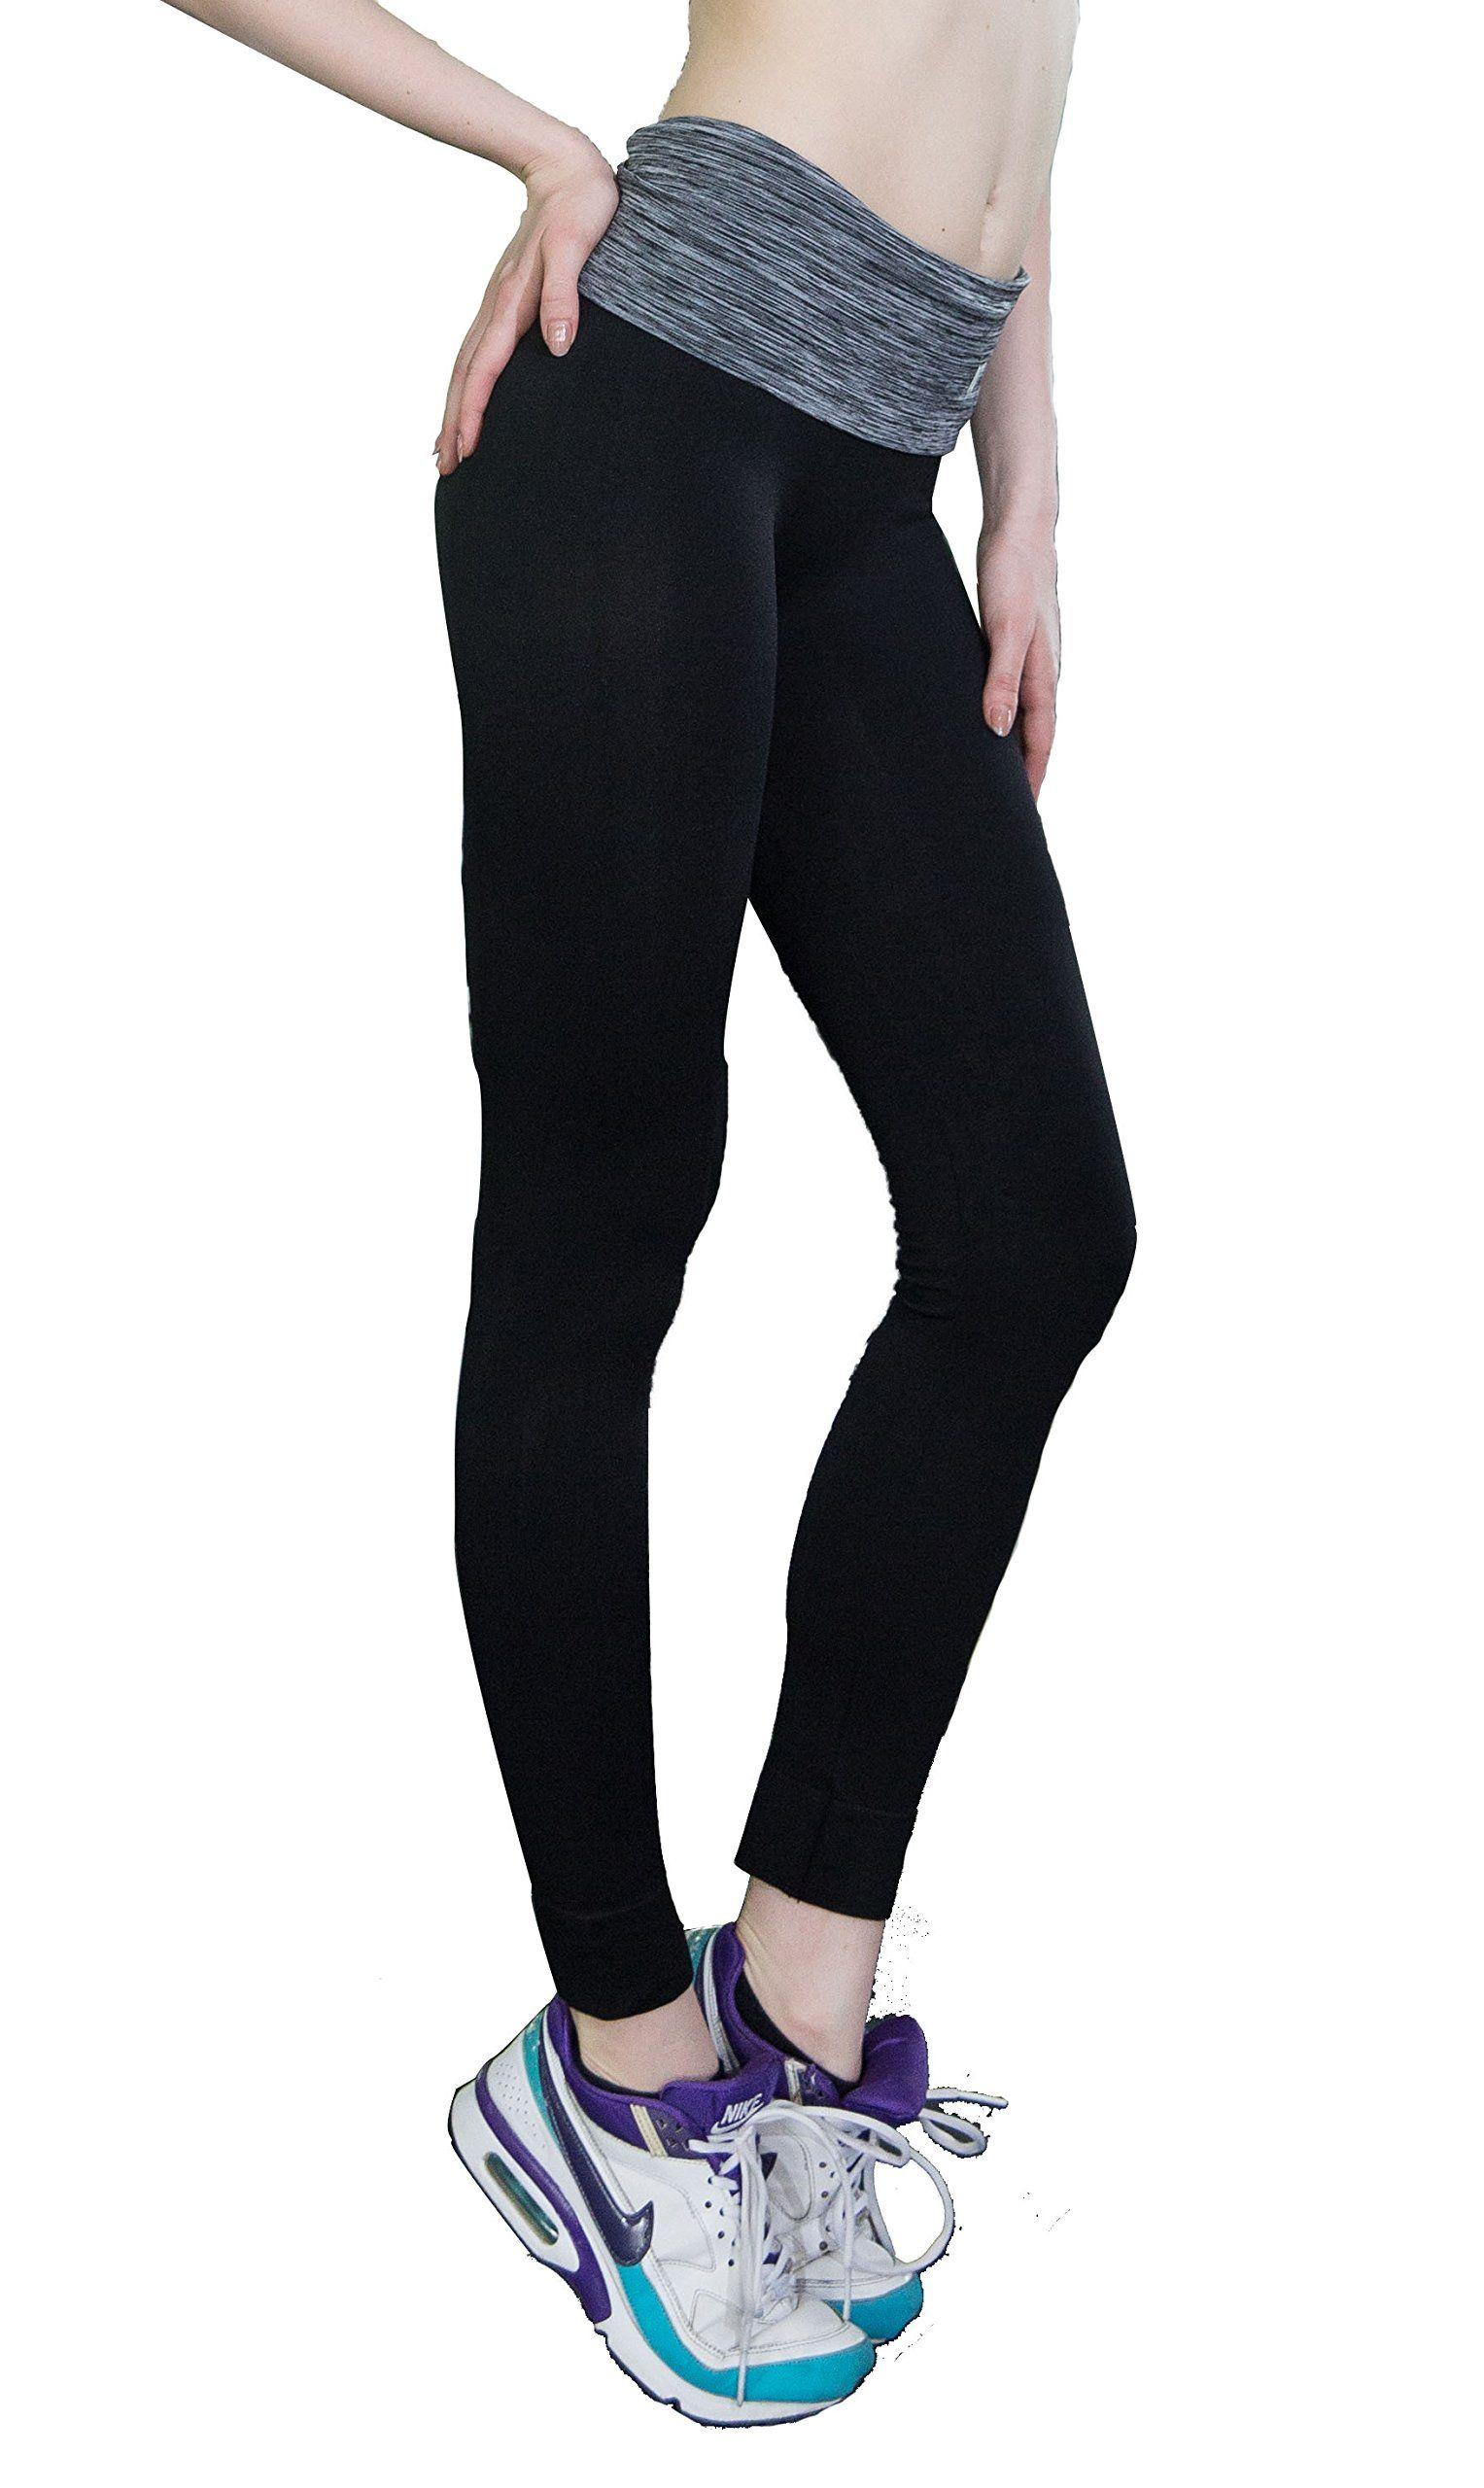 b94e148a4 Sexy Fashion Women Crop Top Punk Heart Cut Out Back Sleeveless Short T-shirt  Tank Tops Black l black Online Shopping   Tomtop